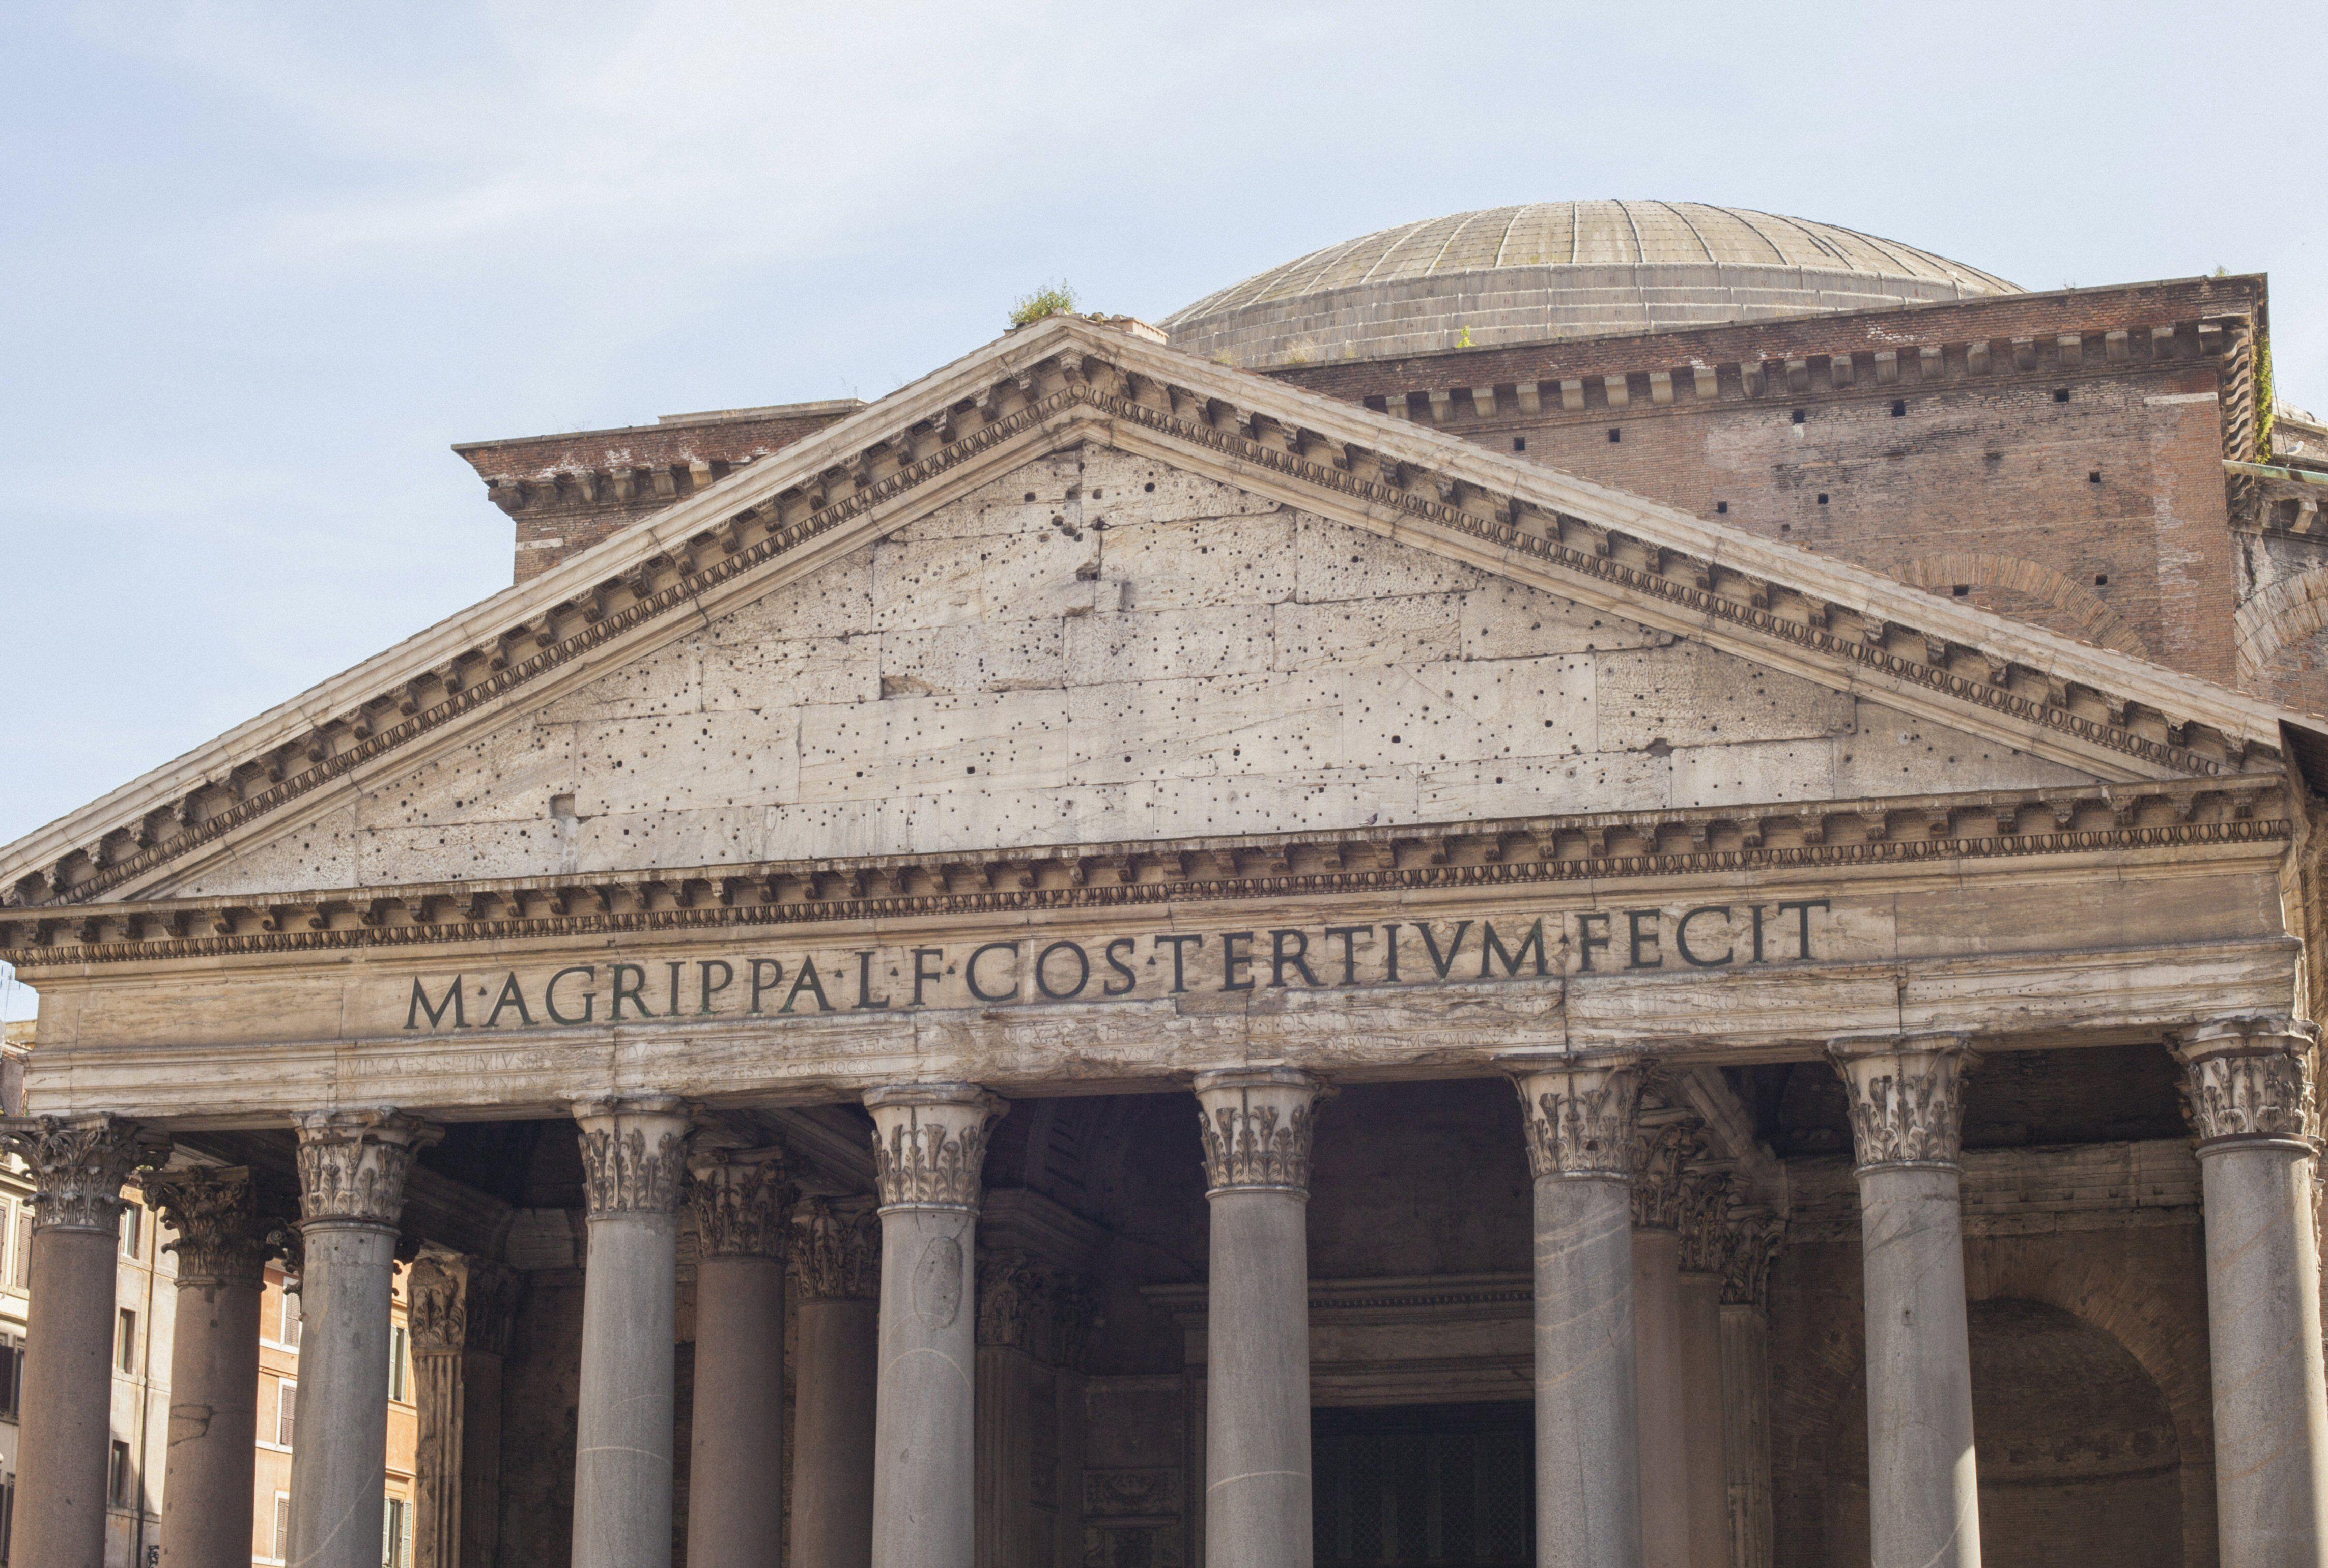 M. AGRIPPA L. F. COS. TERTIUM FECIT carved below a large pediment